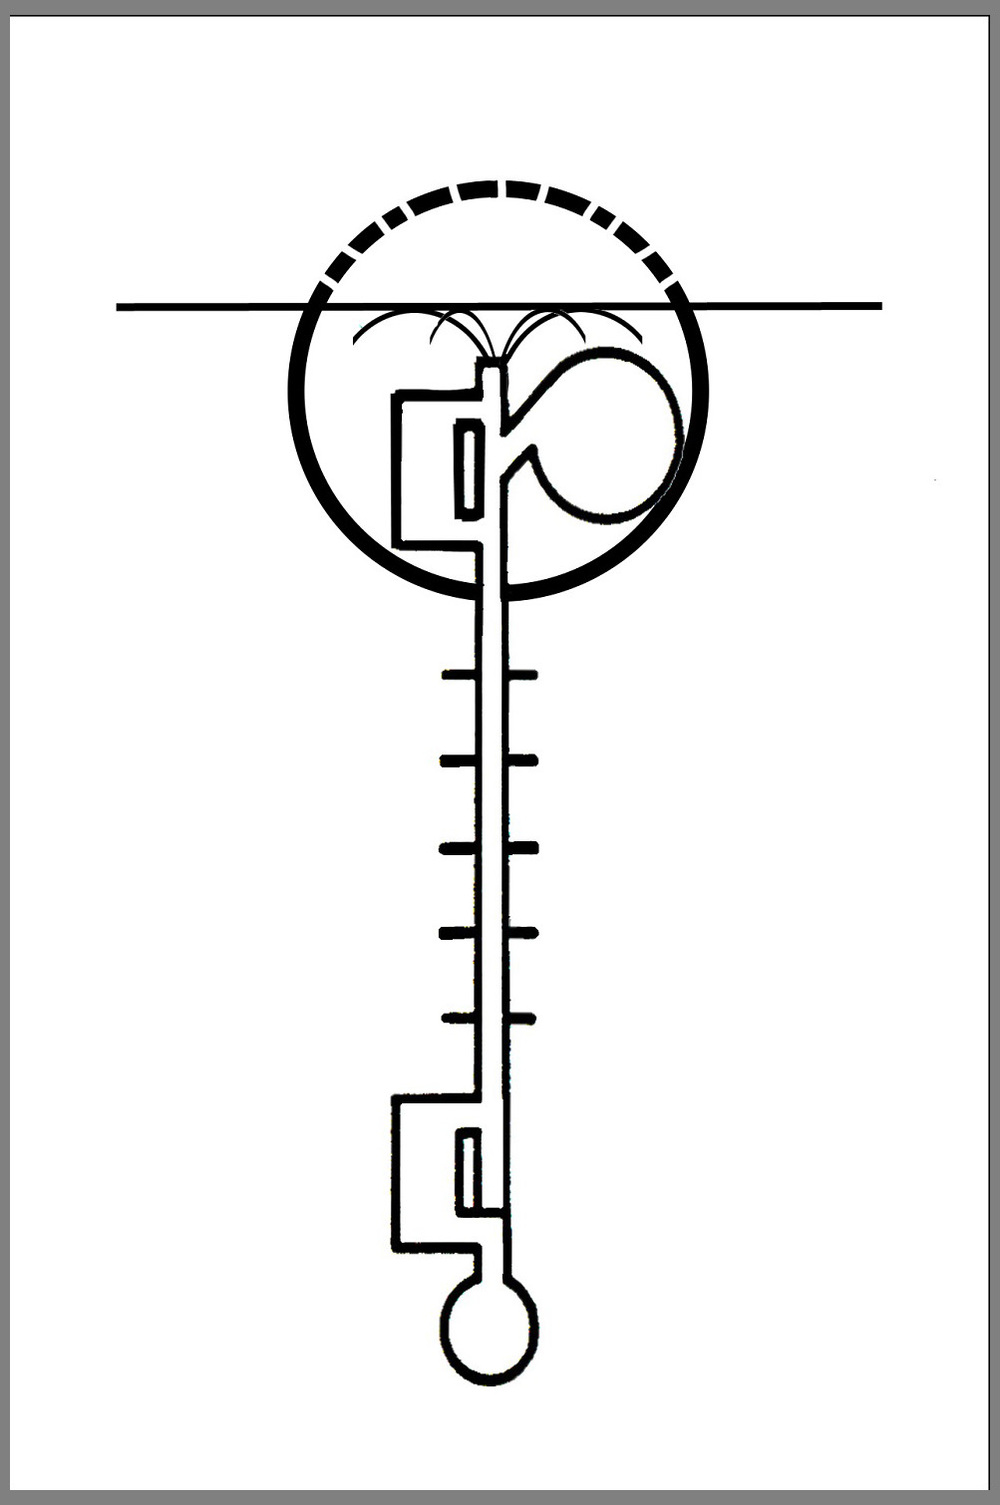 Diagram # 007 illustration